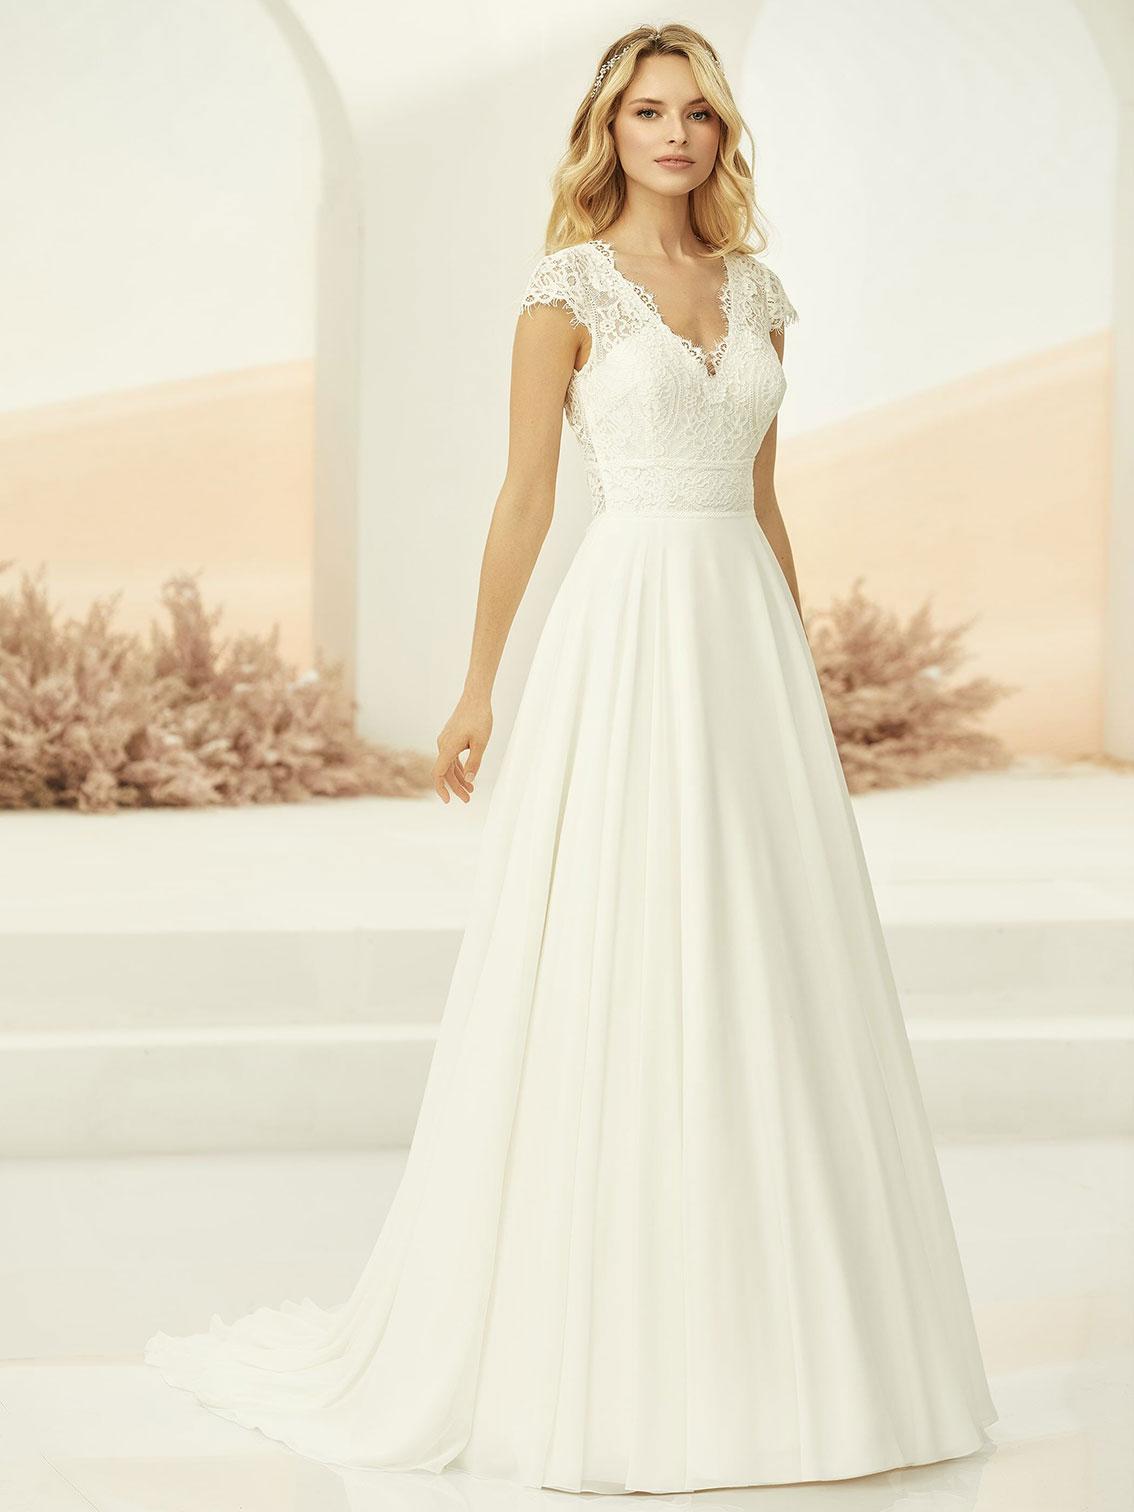 Brautkleid-Perla-front_Bella-Sposa